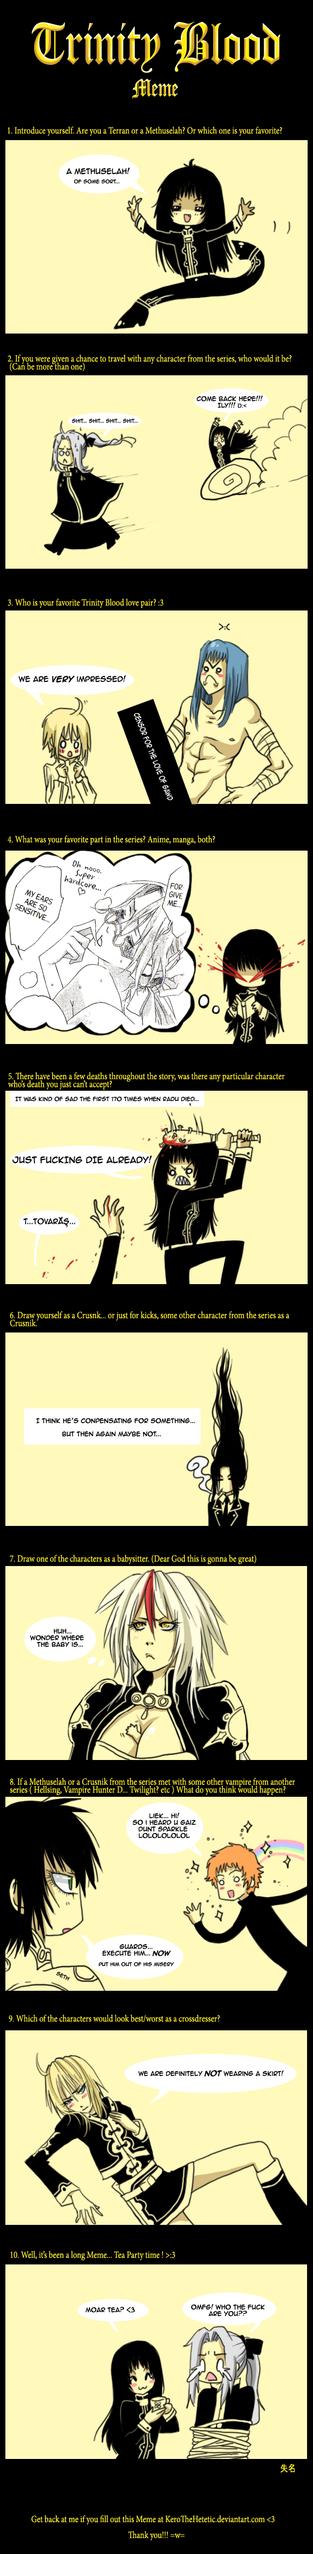 : Trinity Blood Meme Filled : by KarolinaNoumenon